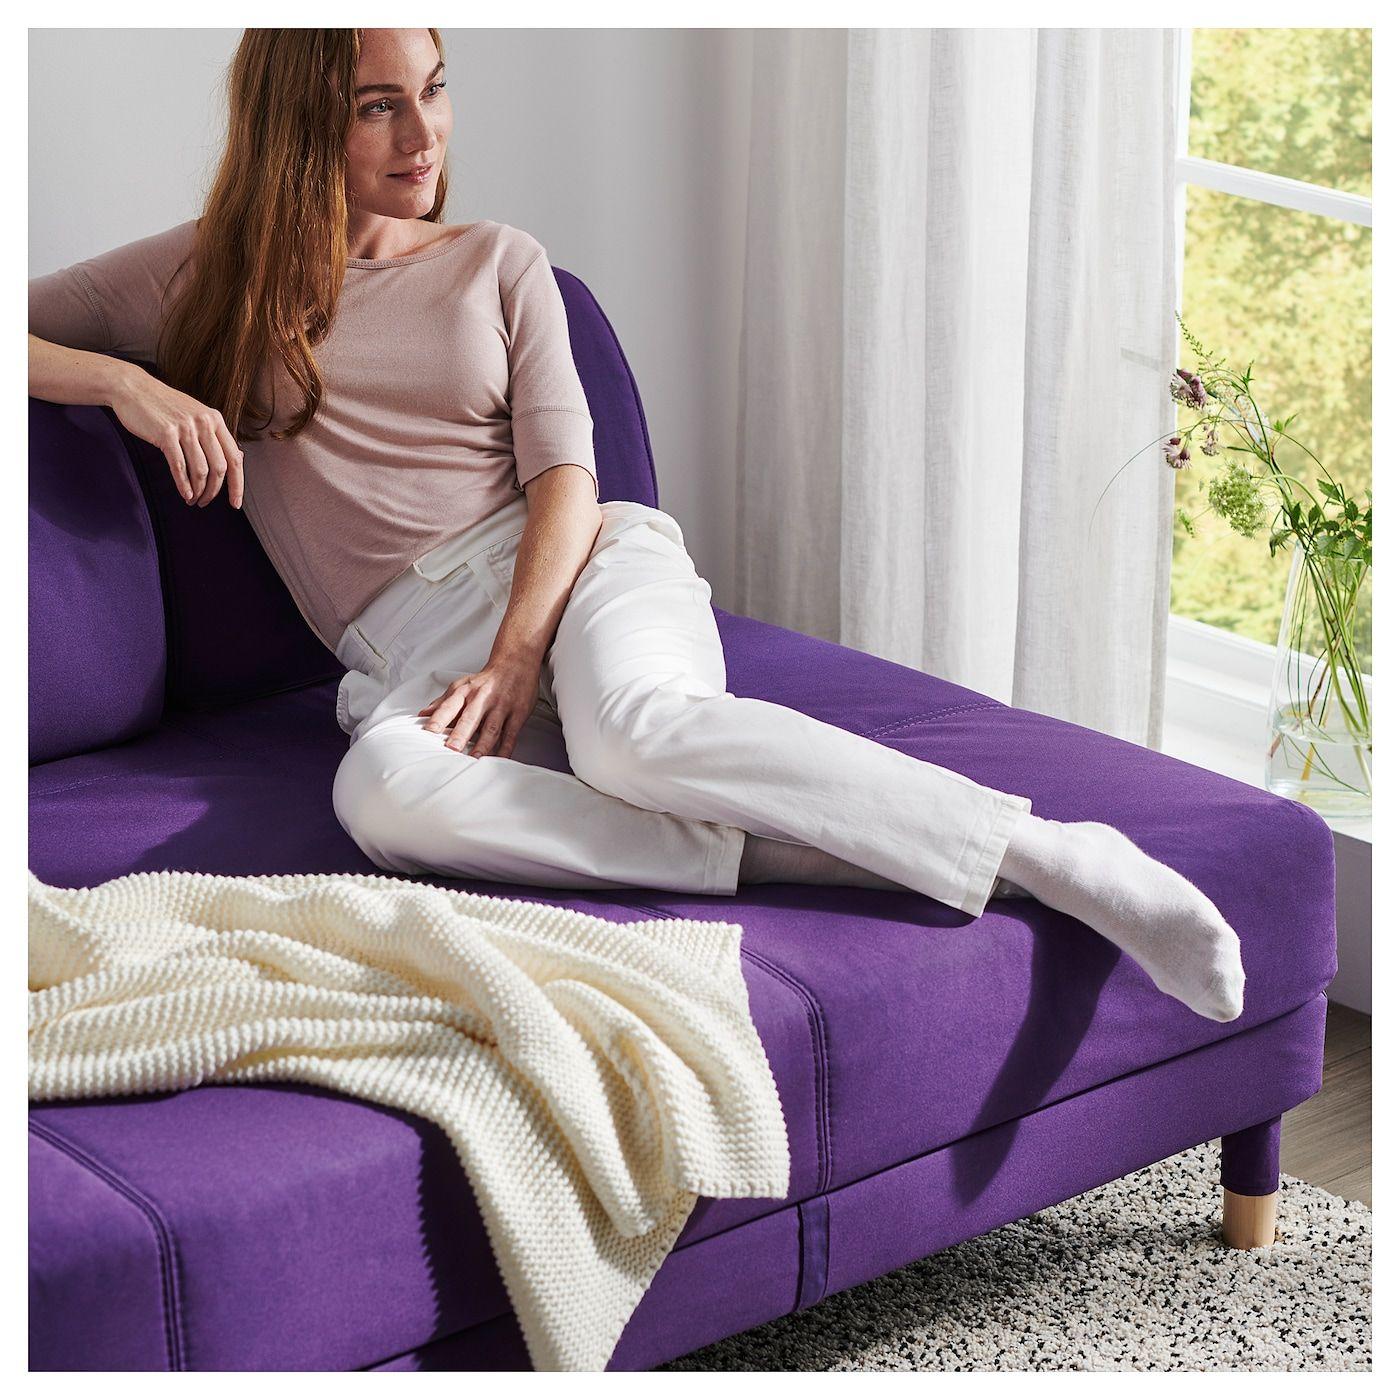 Flottebo Sleeper Sofa With Side Table Vissle Purple 47 1 4 Sleeper Sofa Sofa Sleeper Sofa Mattress